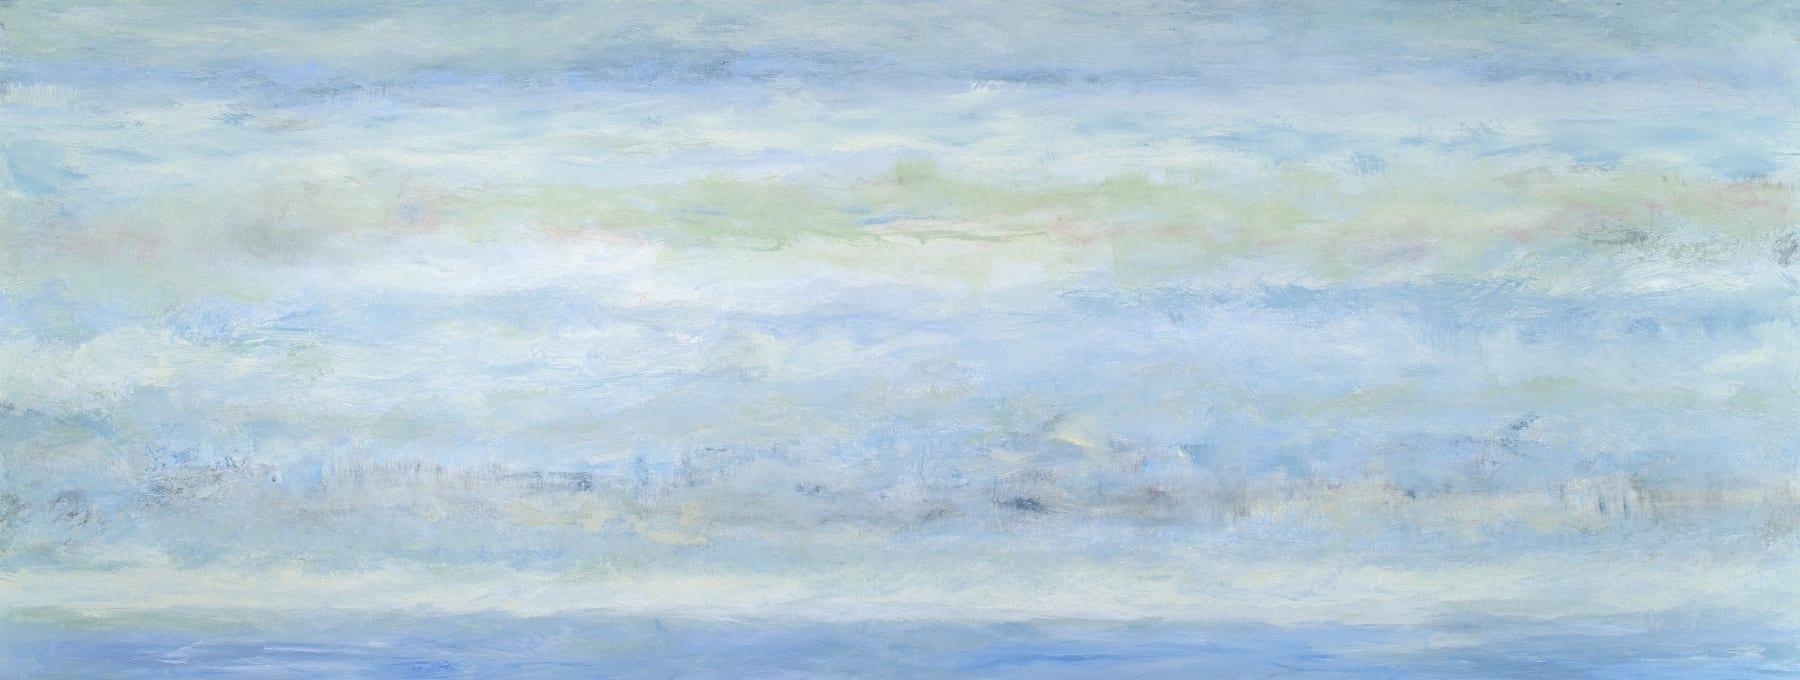 Patricia Qualls, Natures Moods, 2021